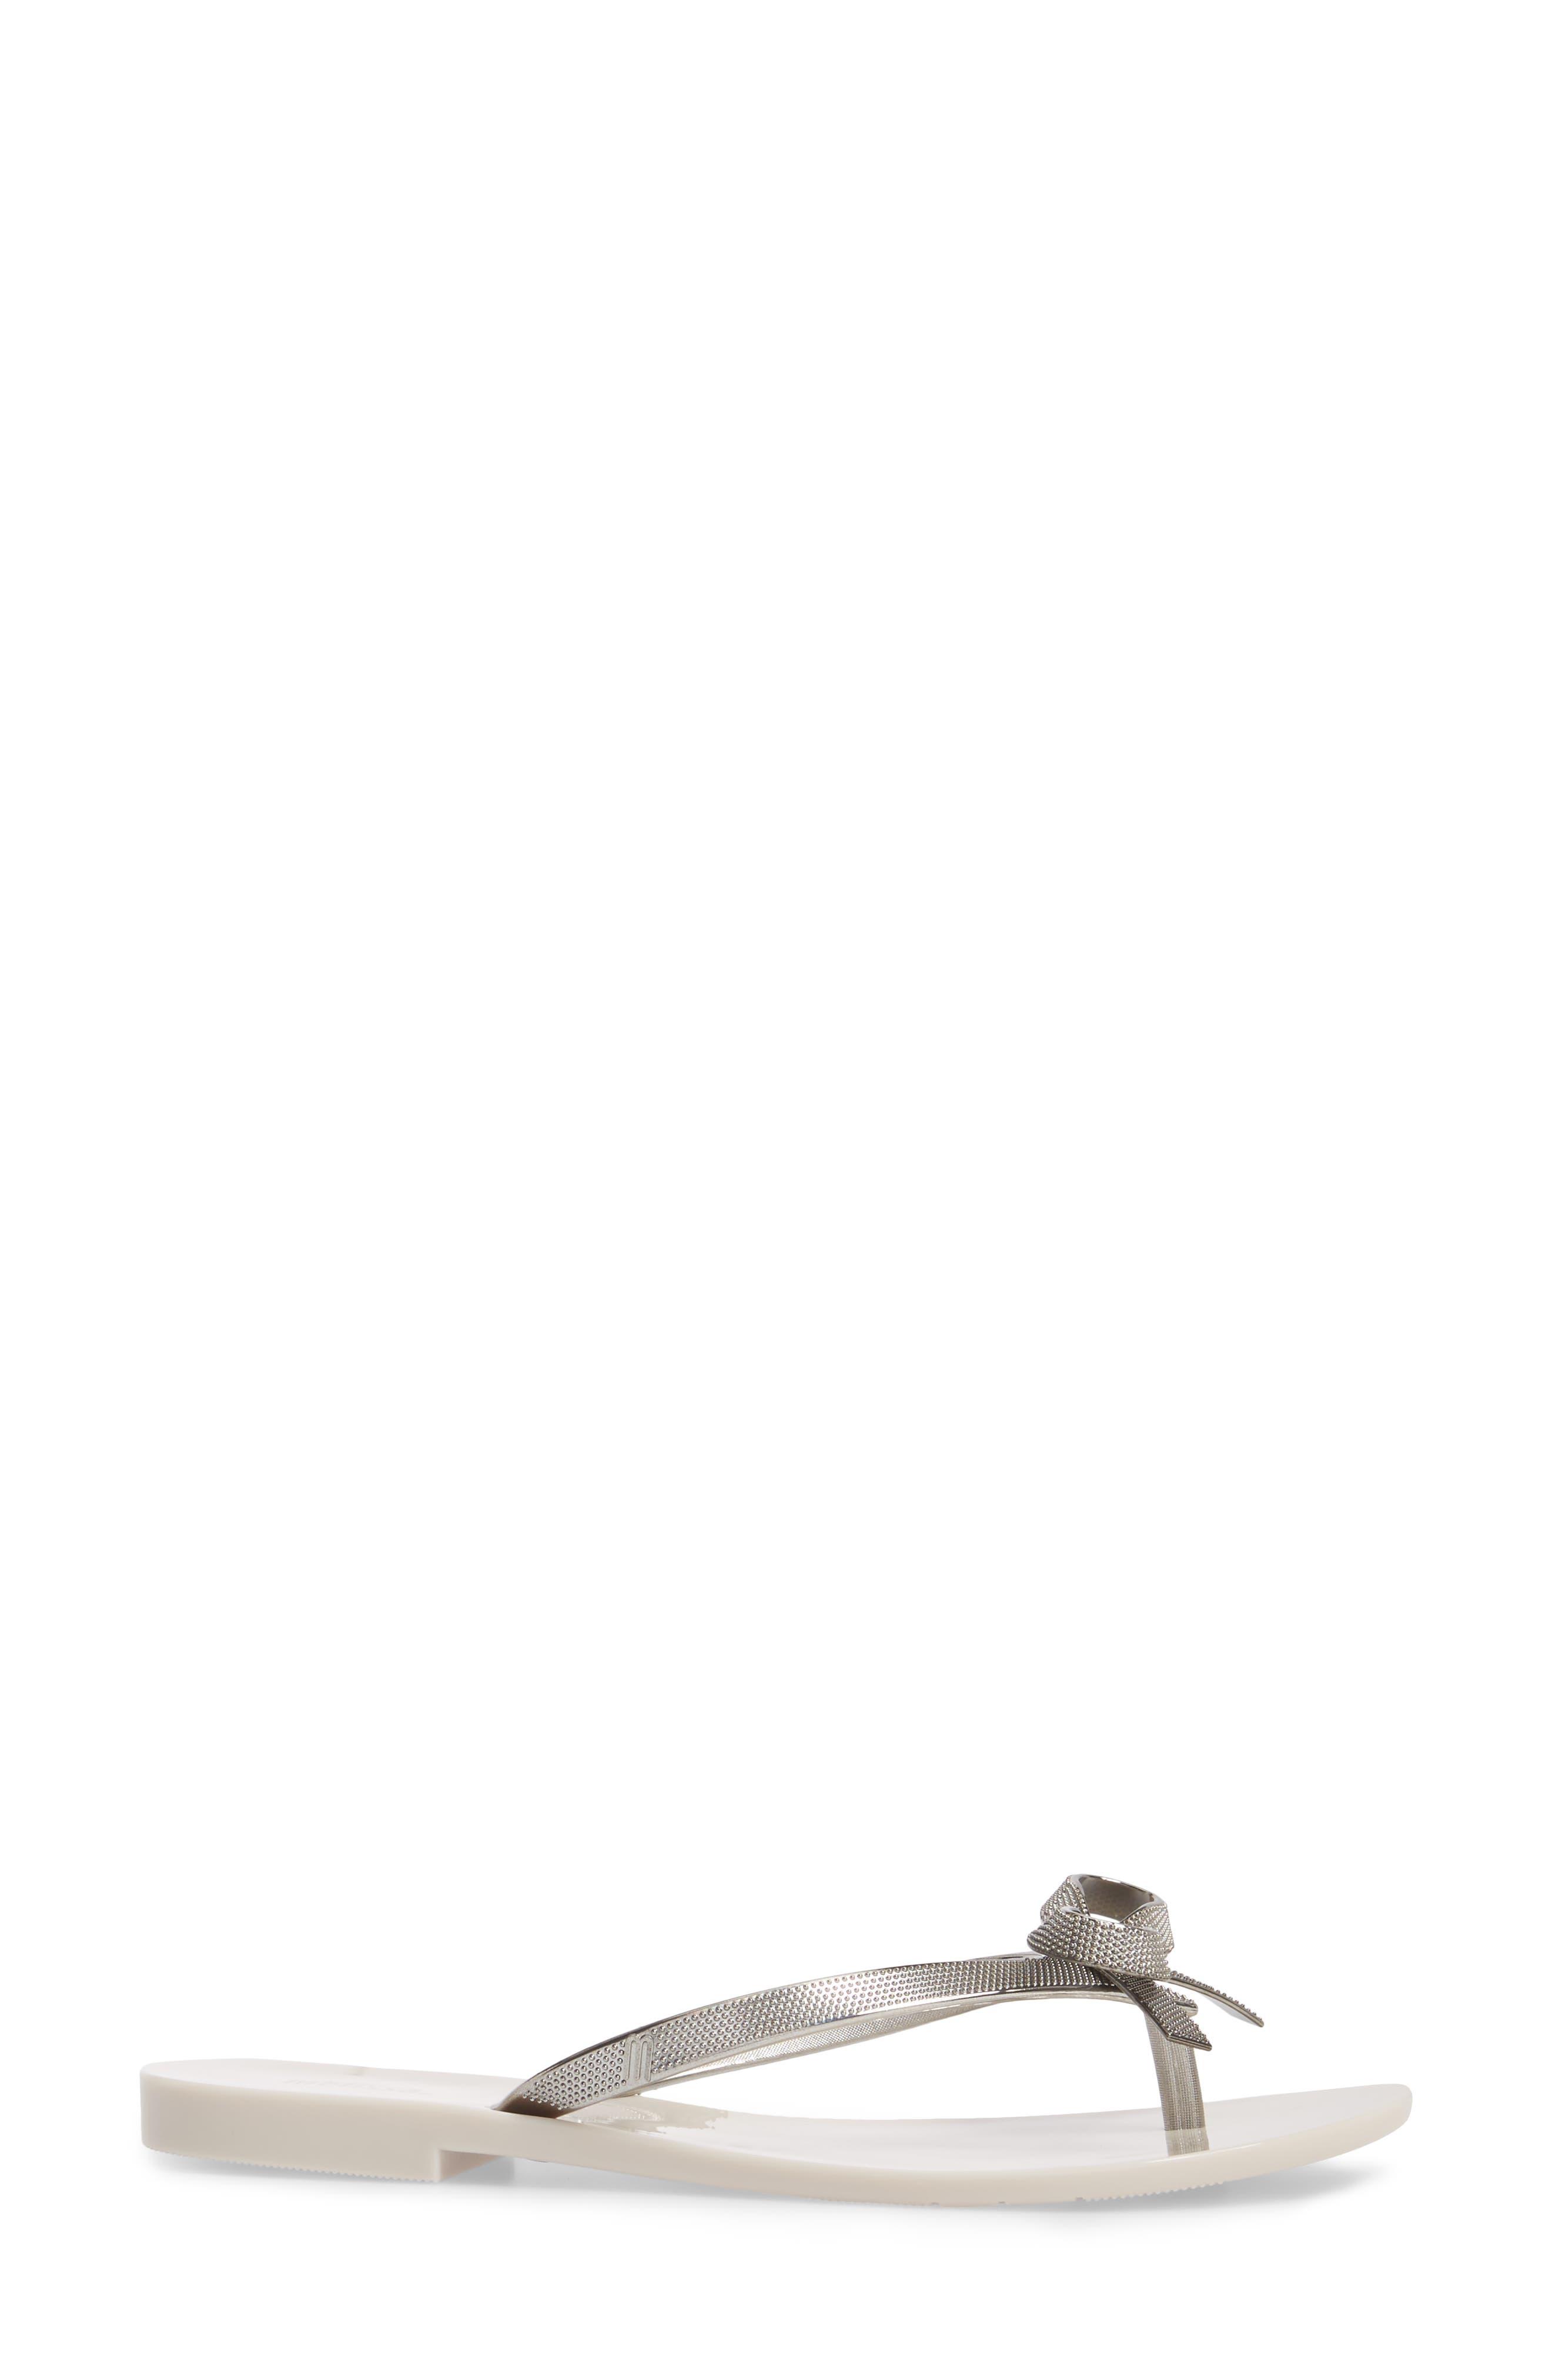 Harmonic Bow Chrome II Sandal,                             Alternate thumbnail 3, color,                             040